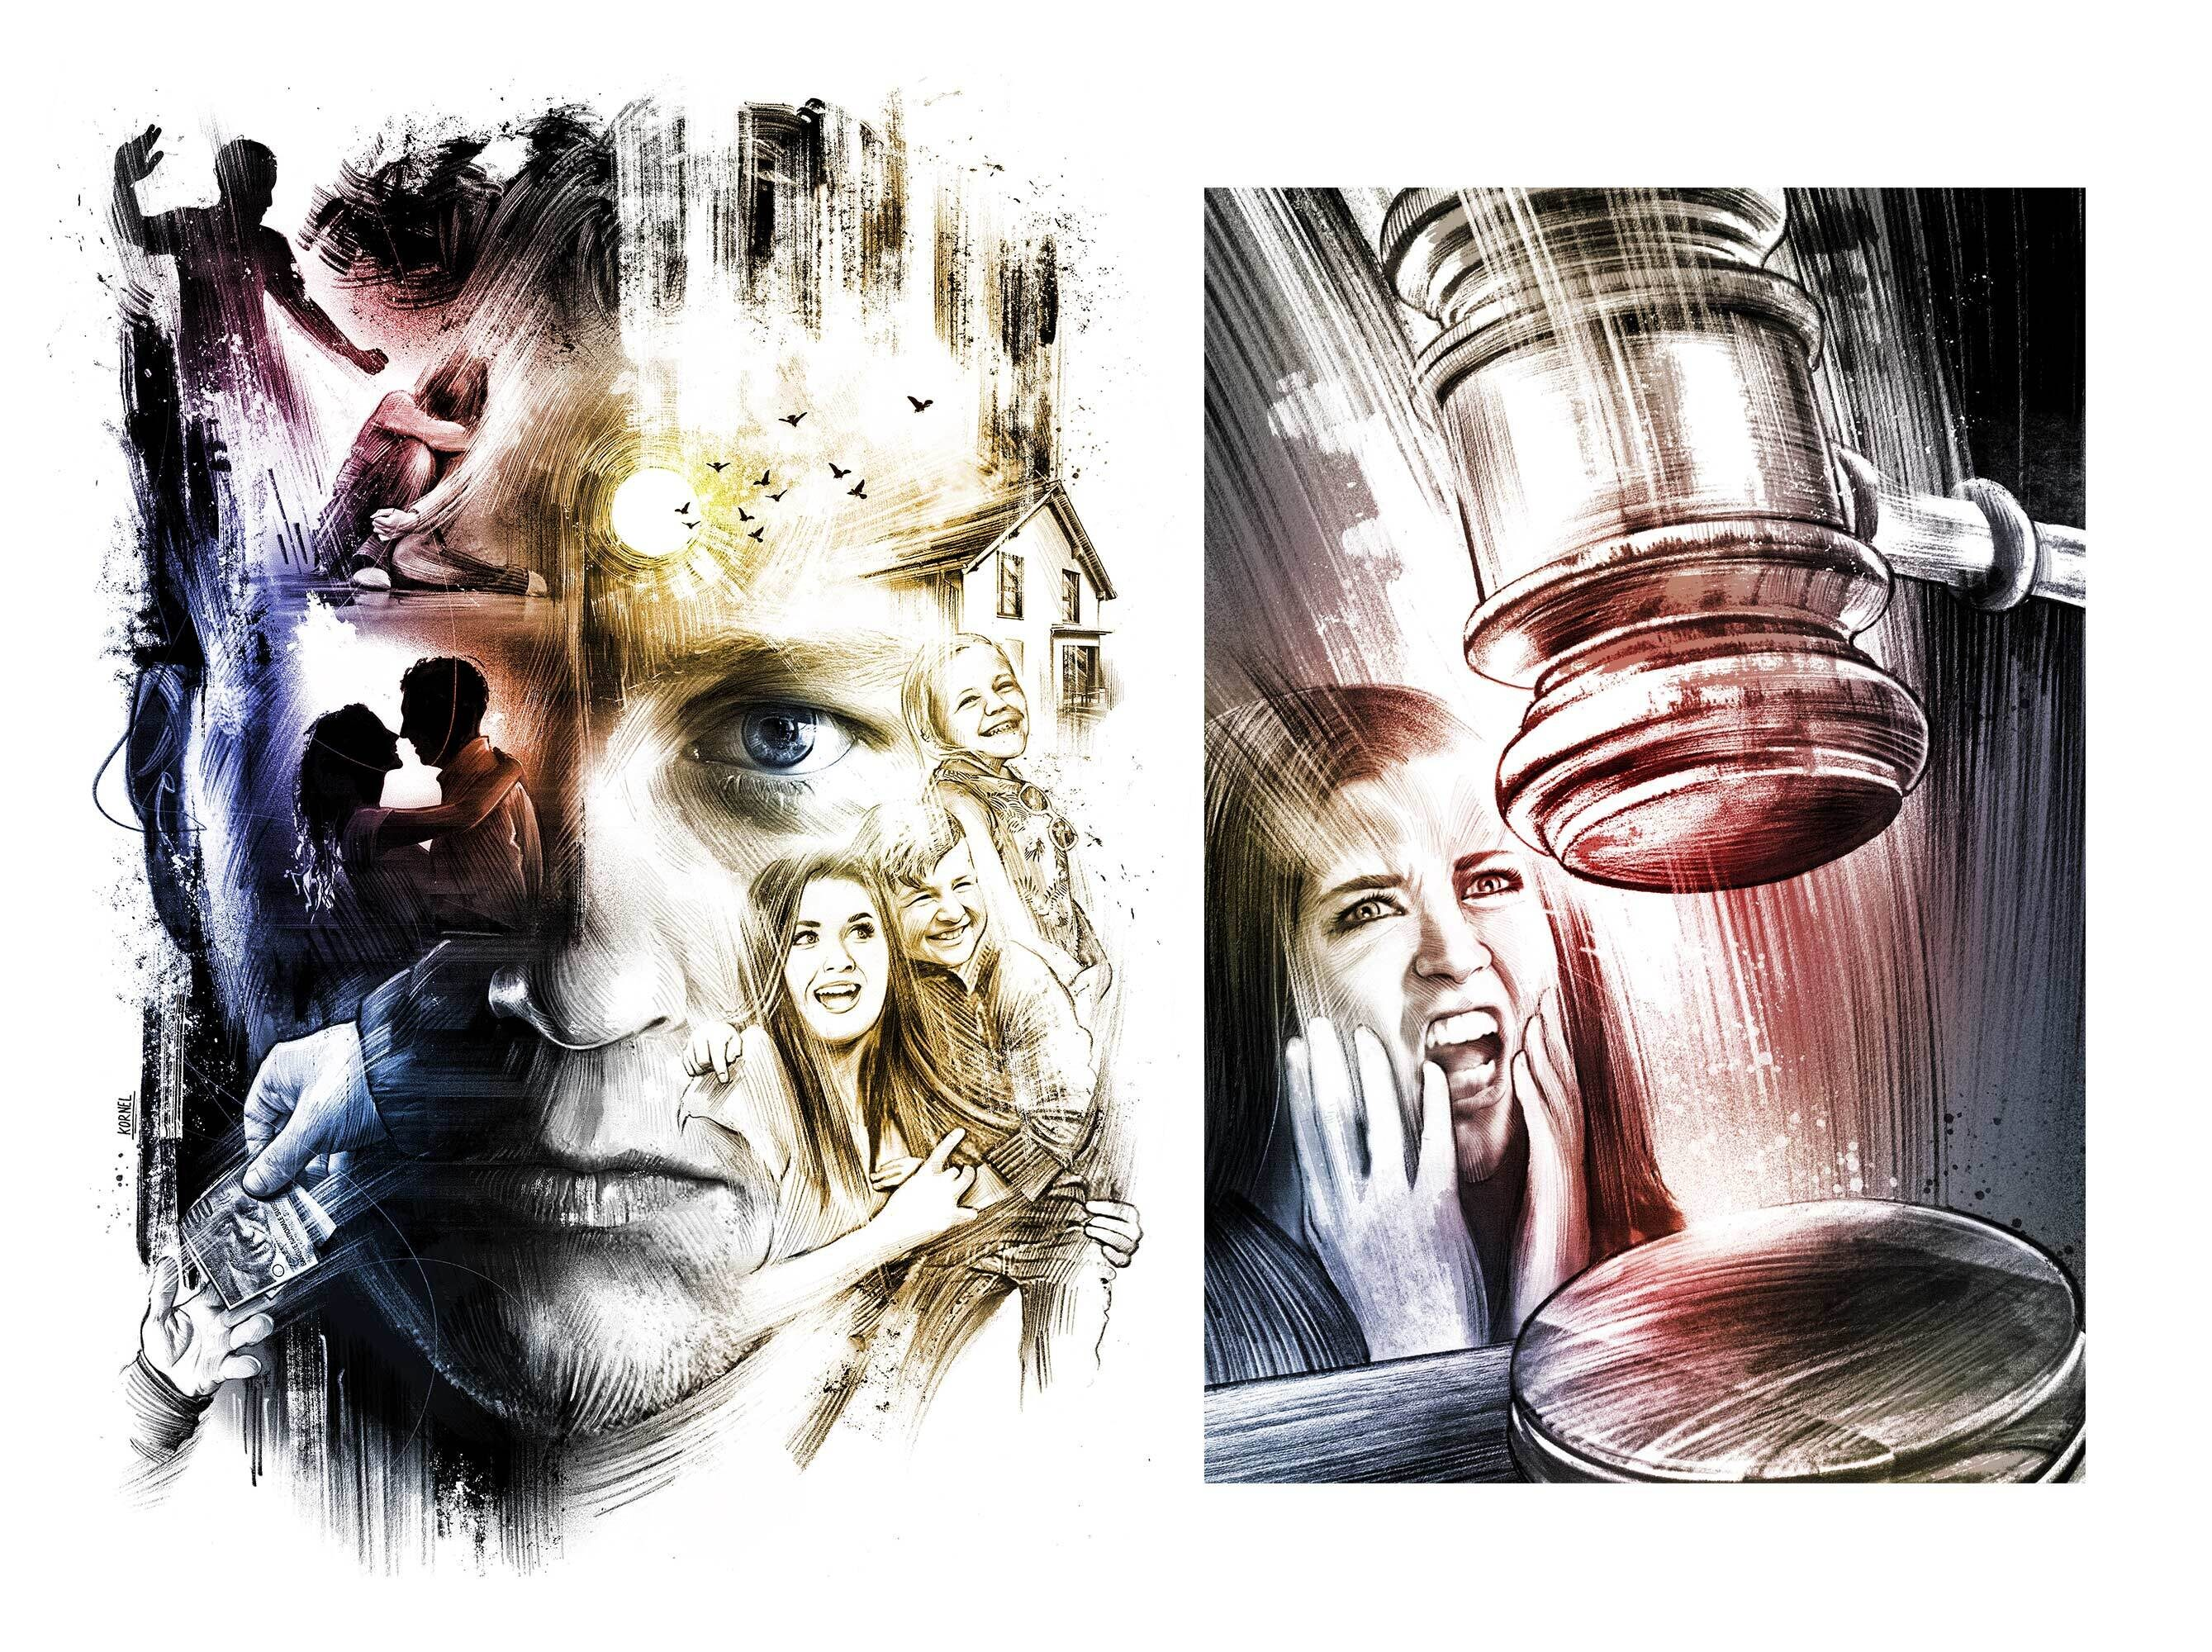 Doppelleben Illustration sonnenseite schattenseite - Kornel Illustration | Kornel Stadler portfolio